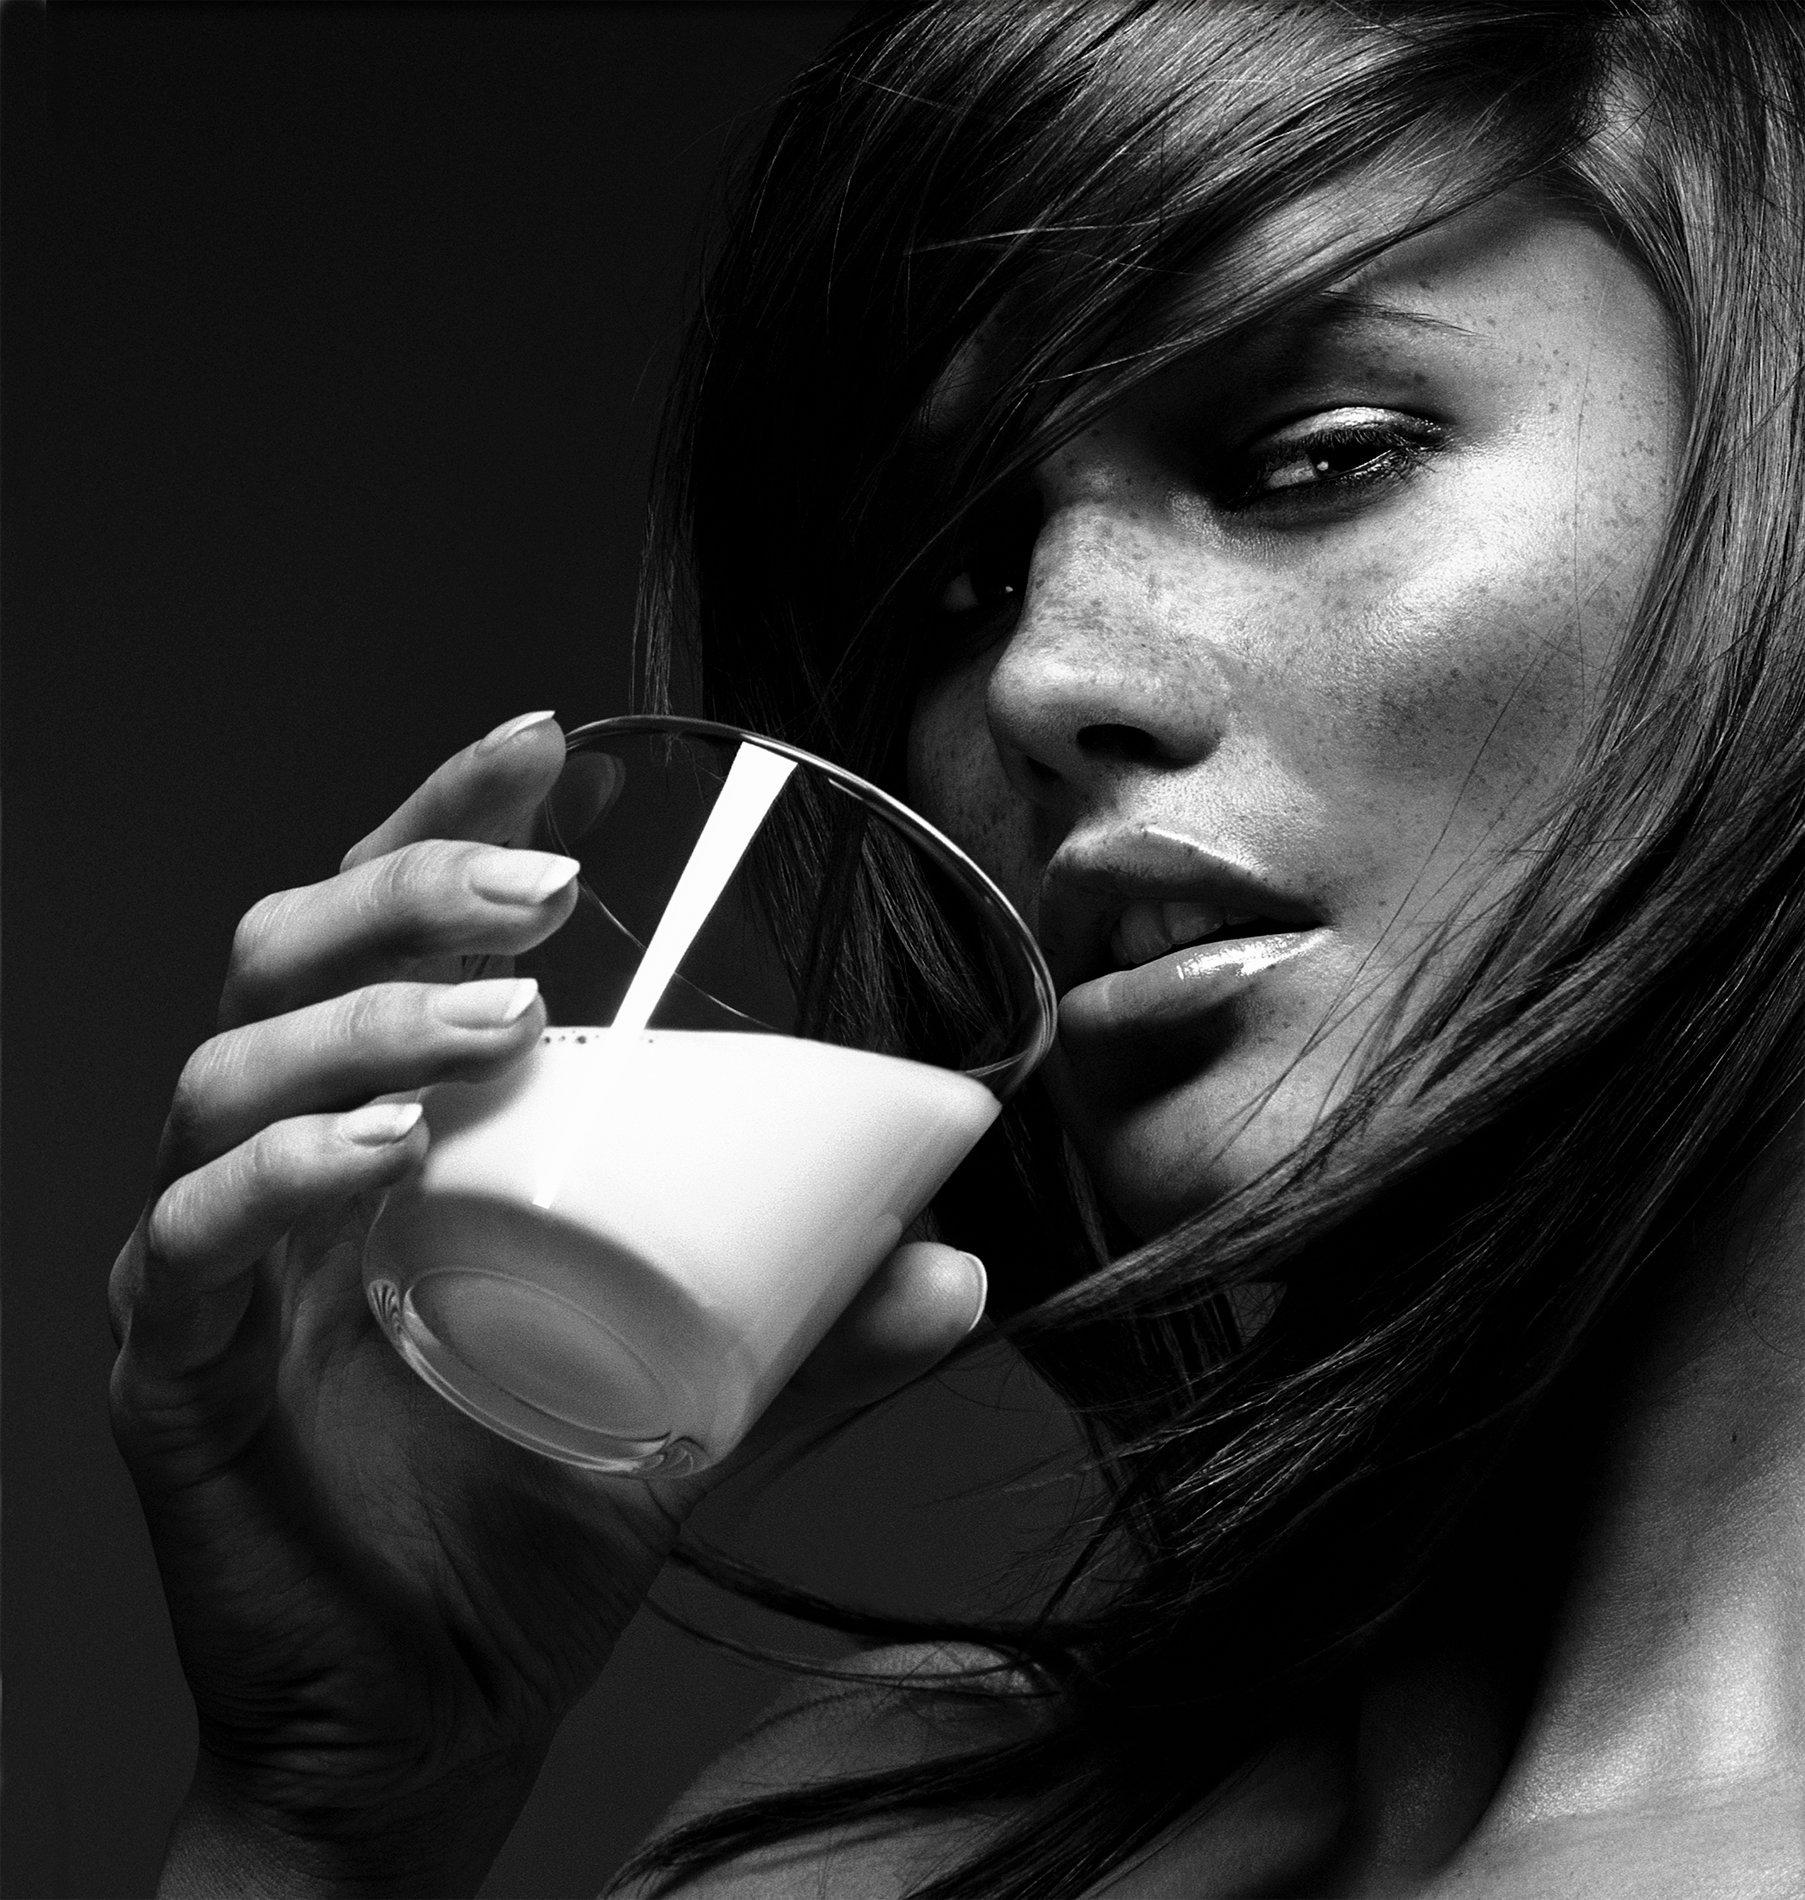 0011_Maria-Gregersen-model-beauty-portrait-Kodak-Professional-b-w-film-copyright-photographer-Kenneth Rimm.jpg